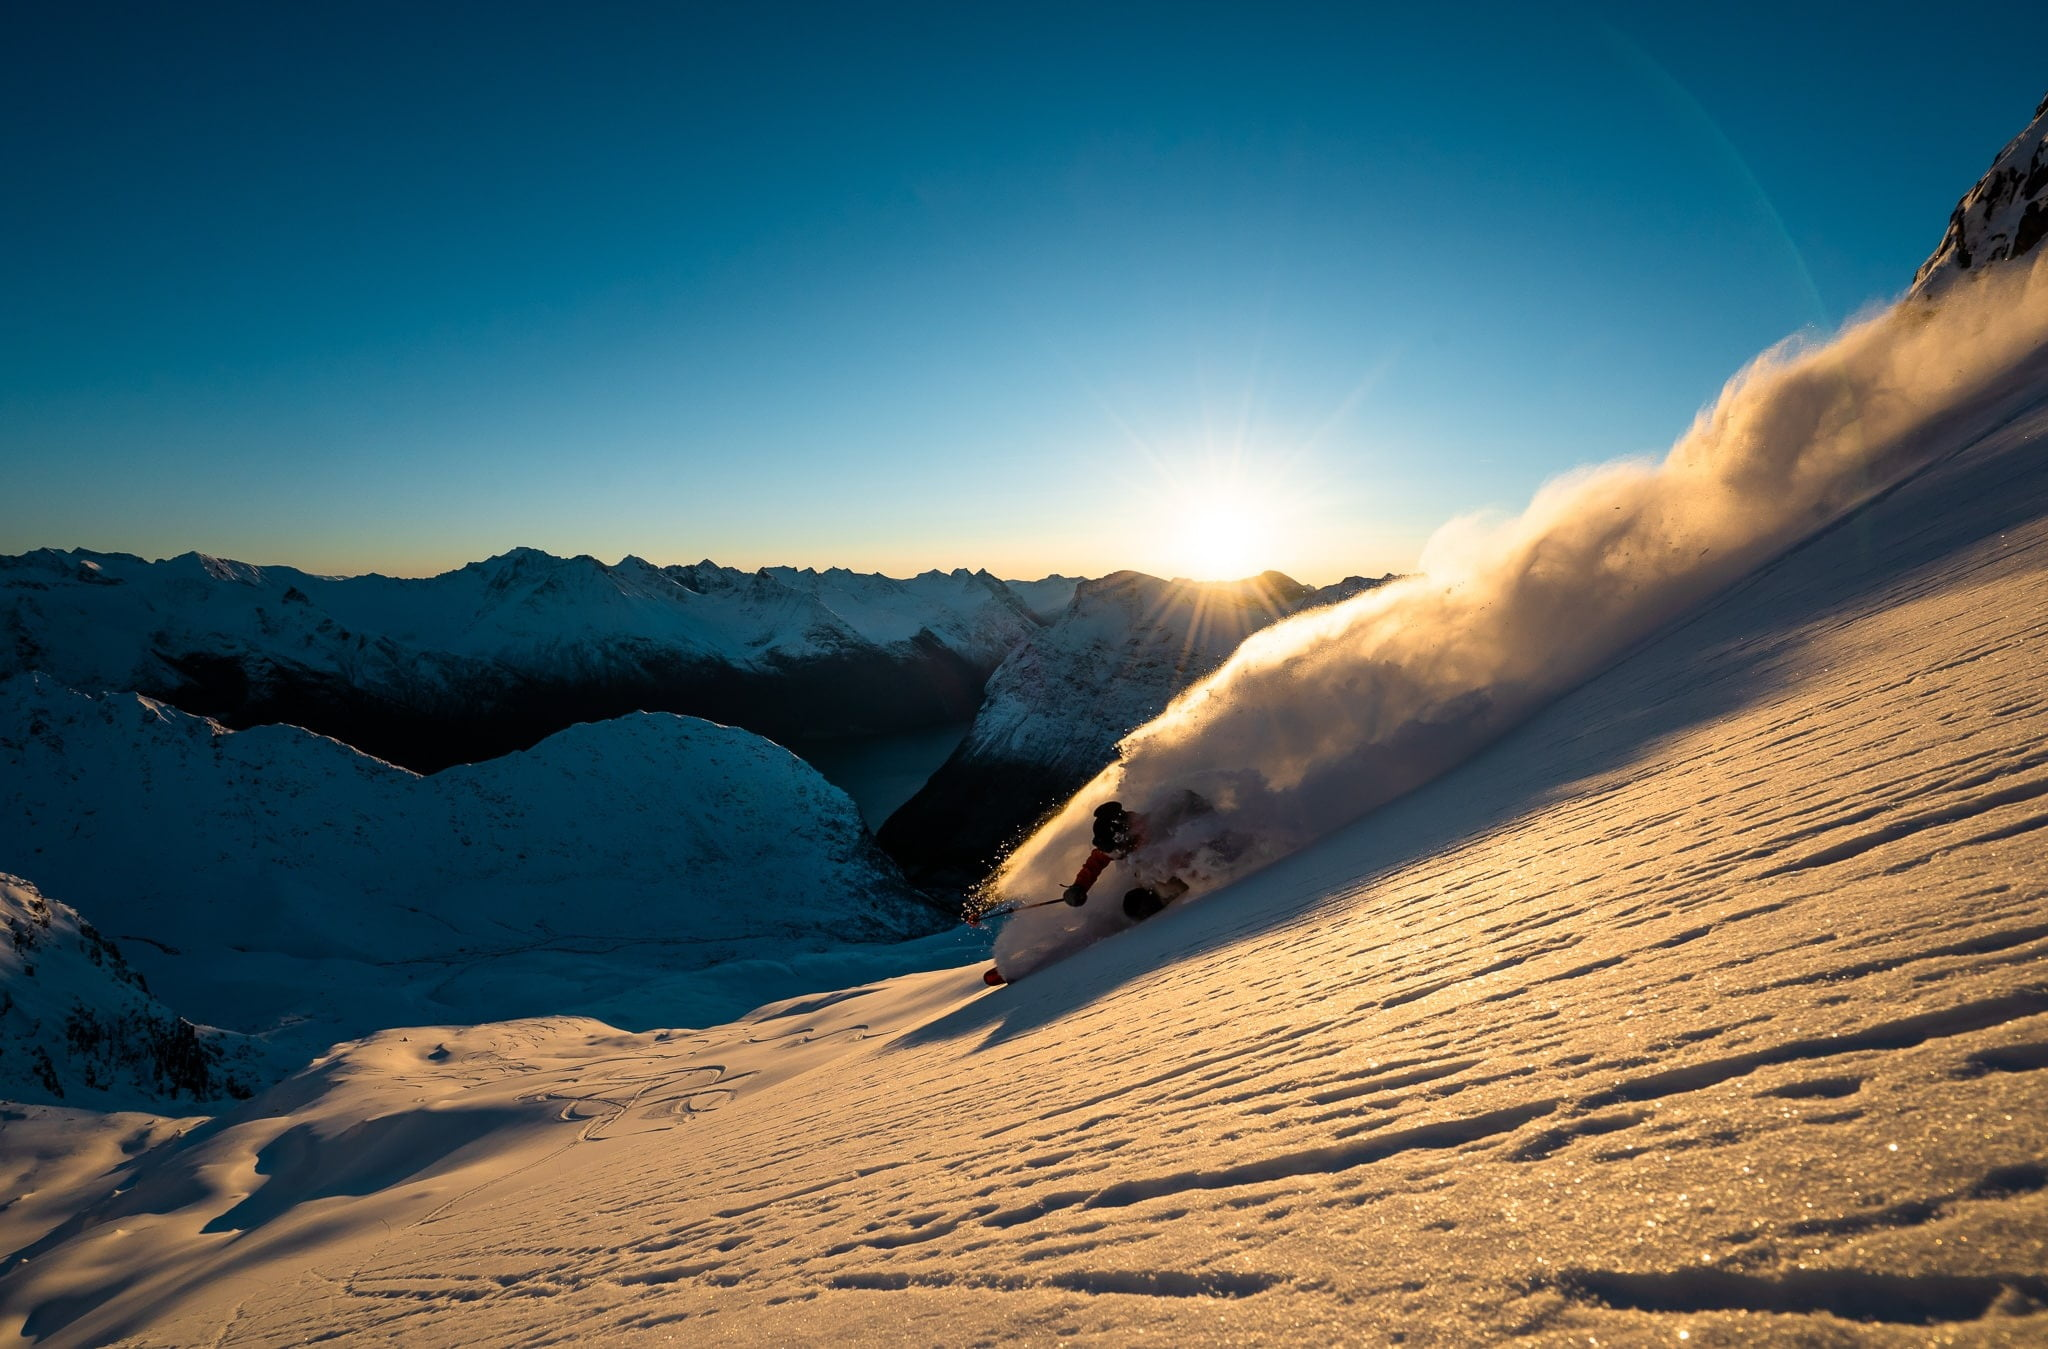 Geological phenomenon, Sunlight, Slope, Winter